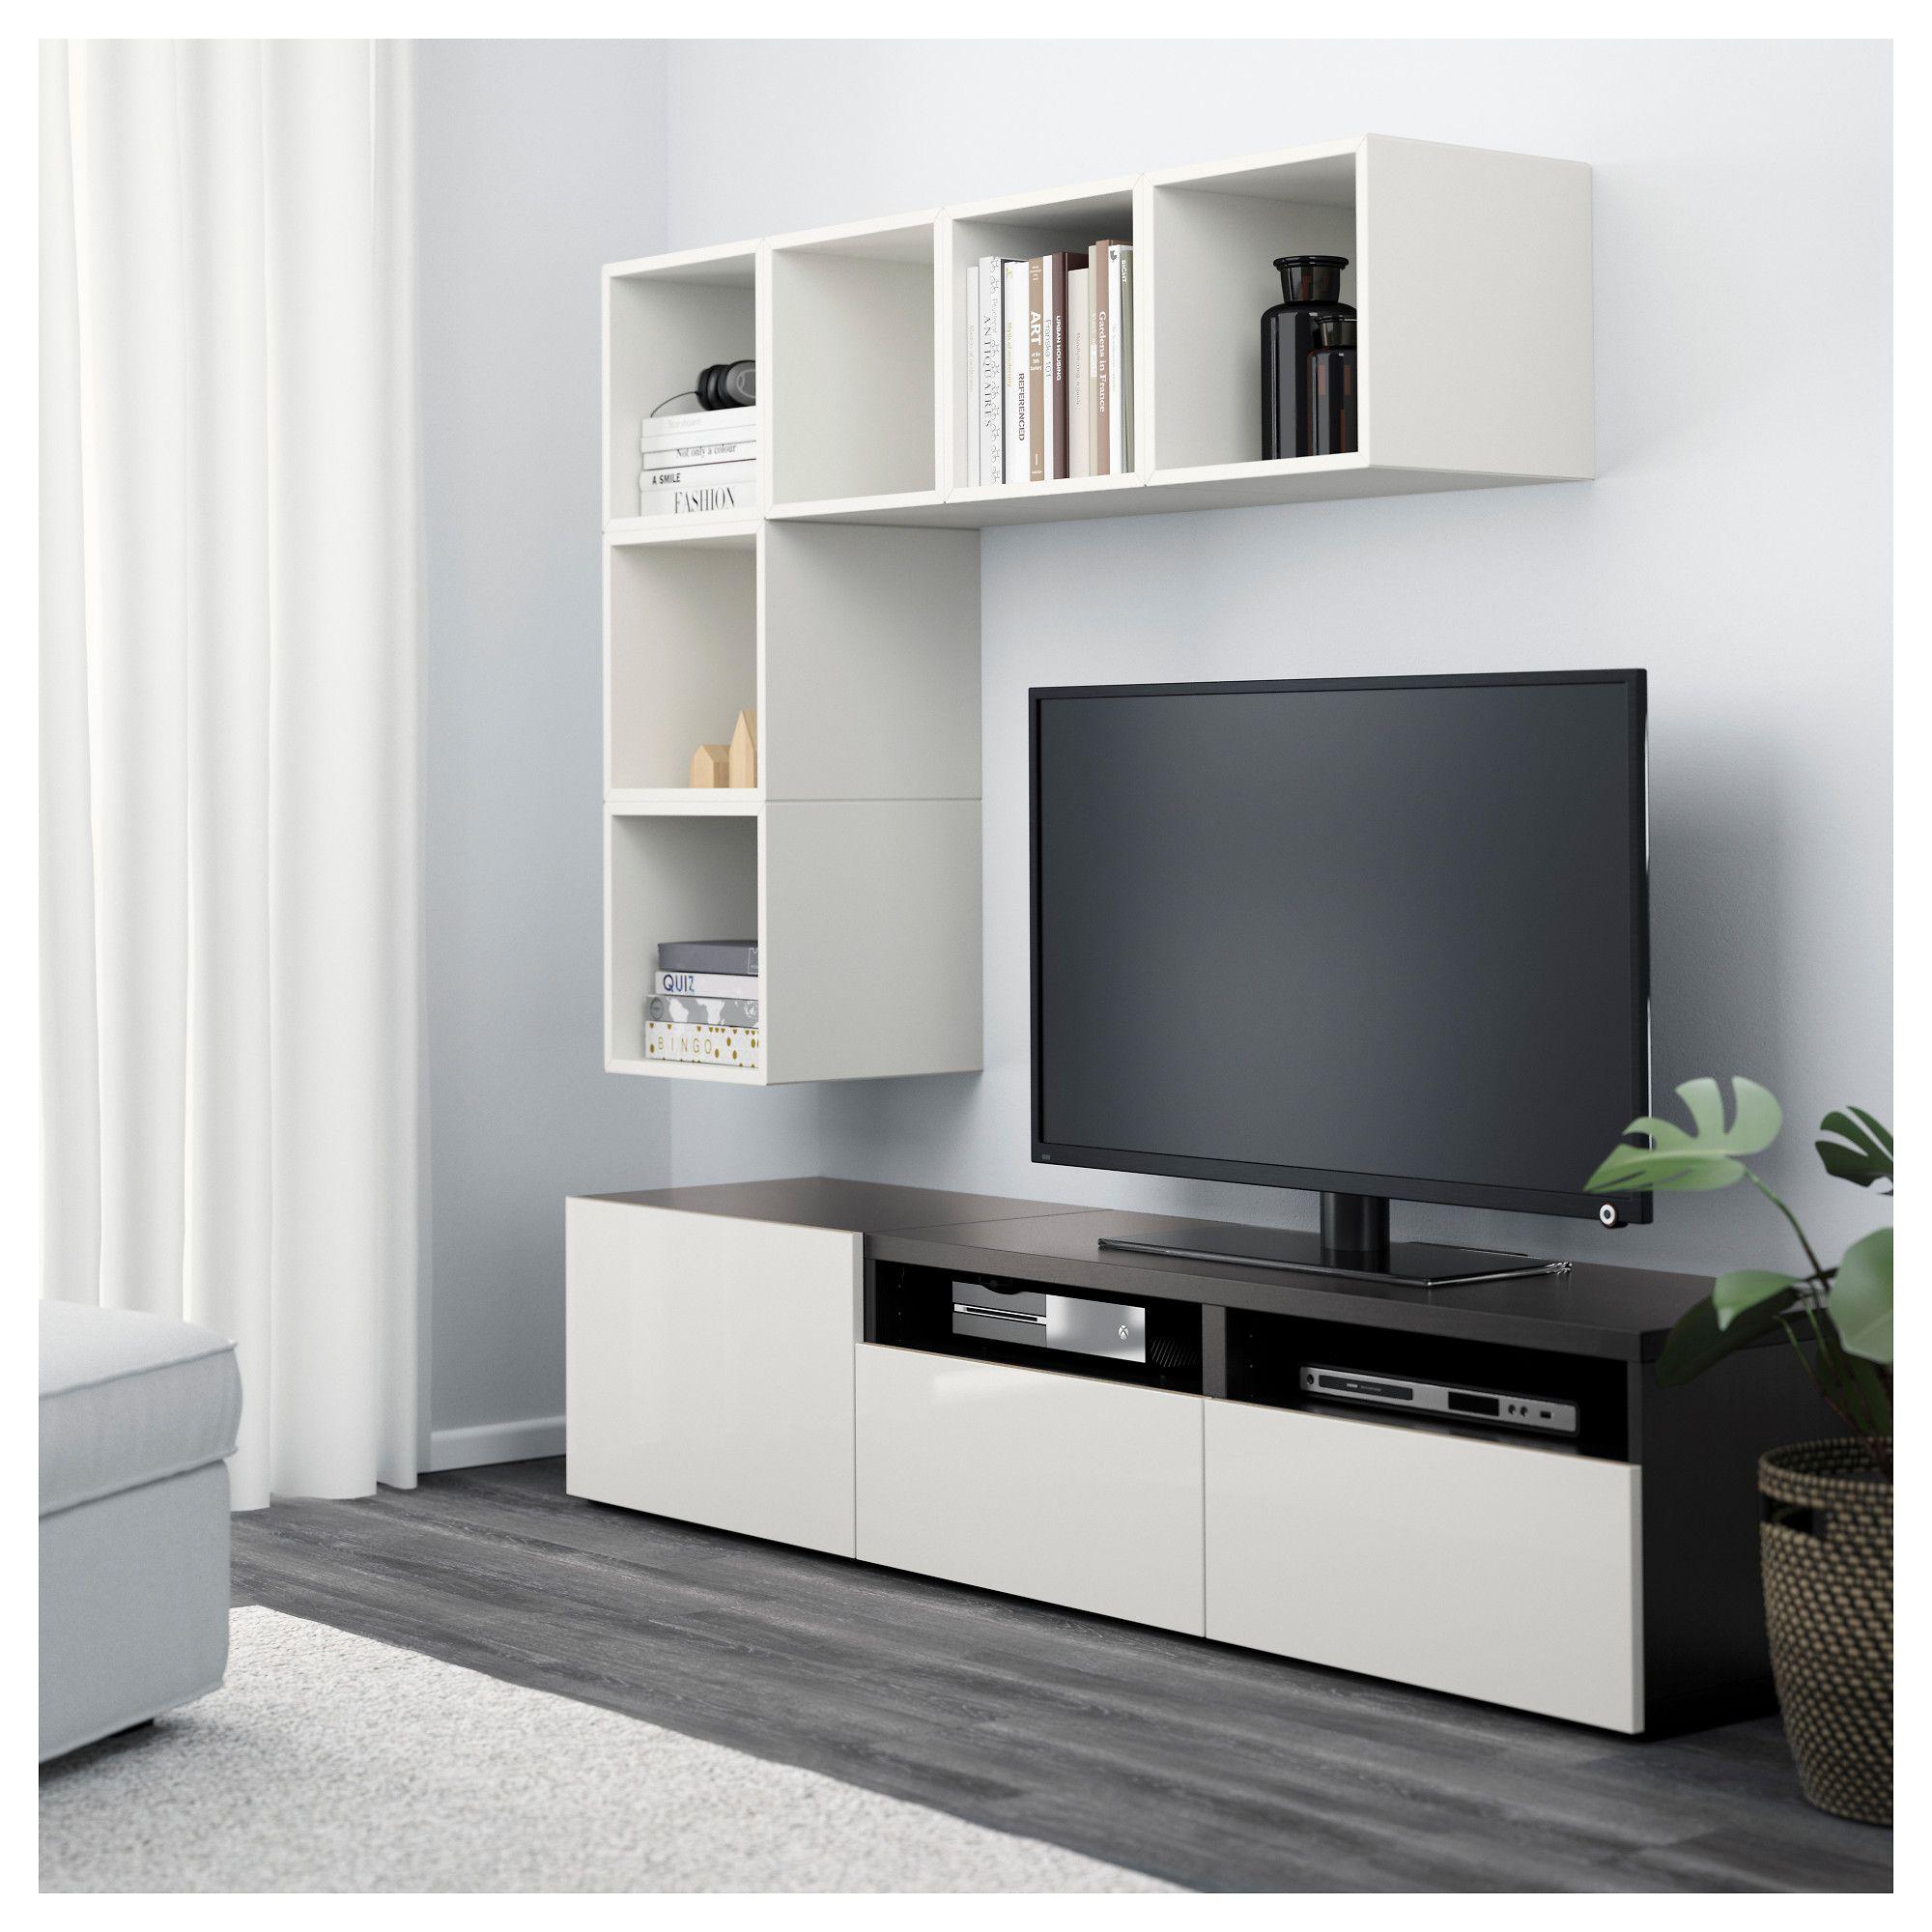 Ikea Besta Eket Tv Storage Combination White Black Brown Tv Storage Eket Ikea Tv